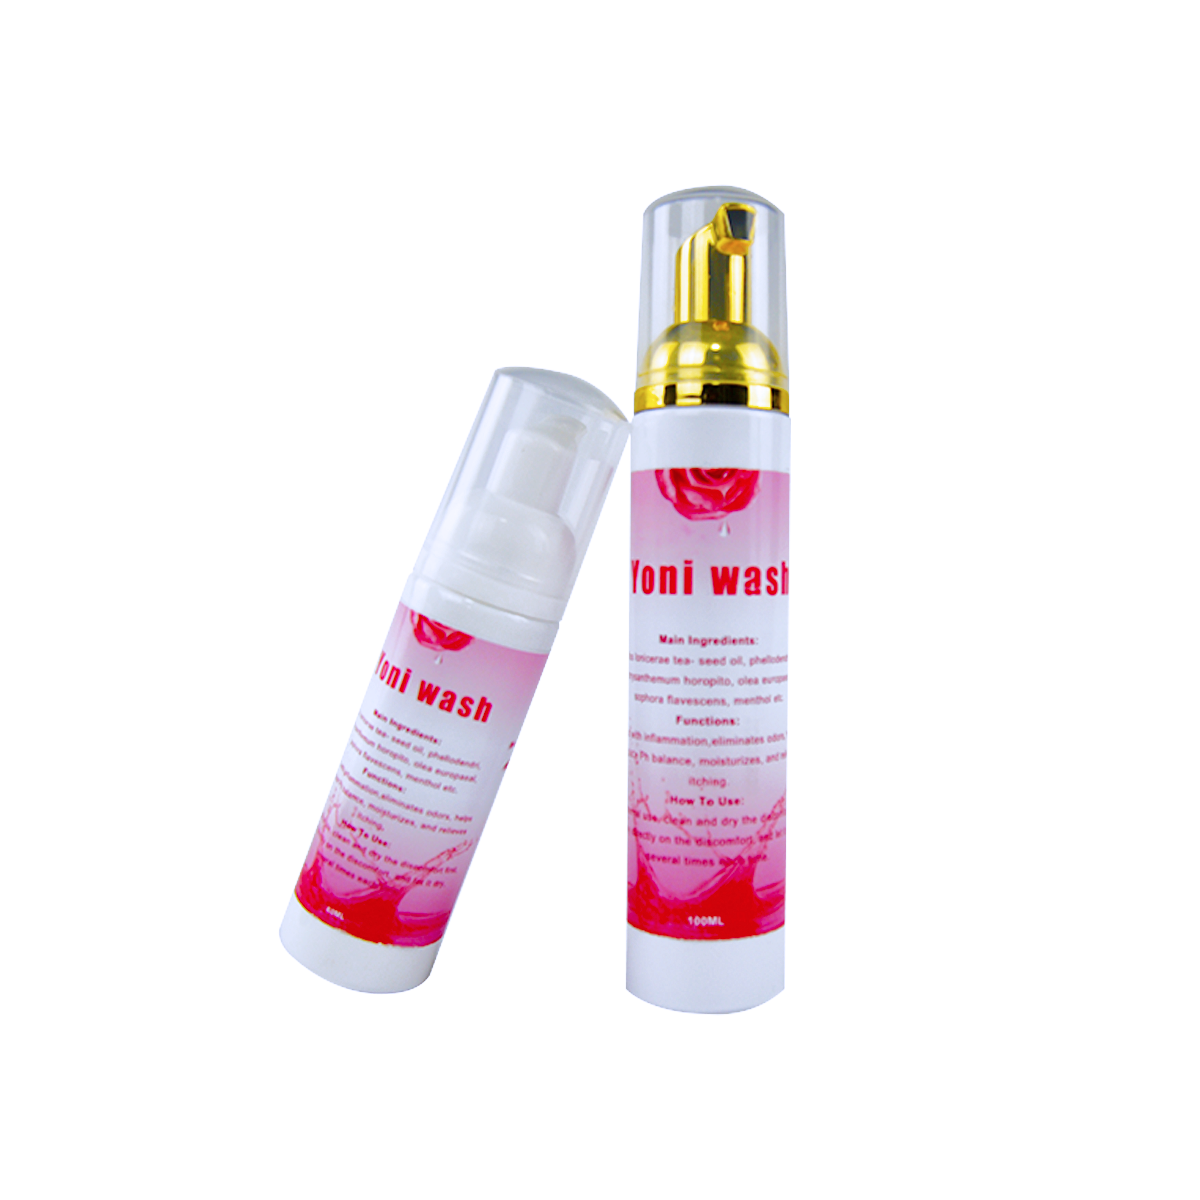 100% natural natural tightening organic yoni spray feminine wash hygiene for vagina care private label